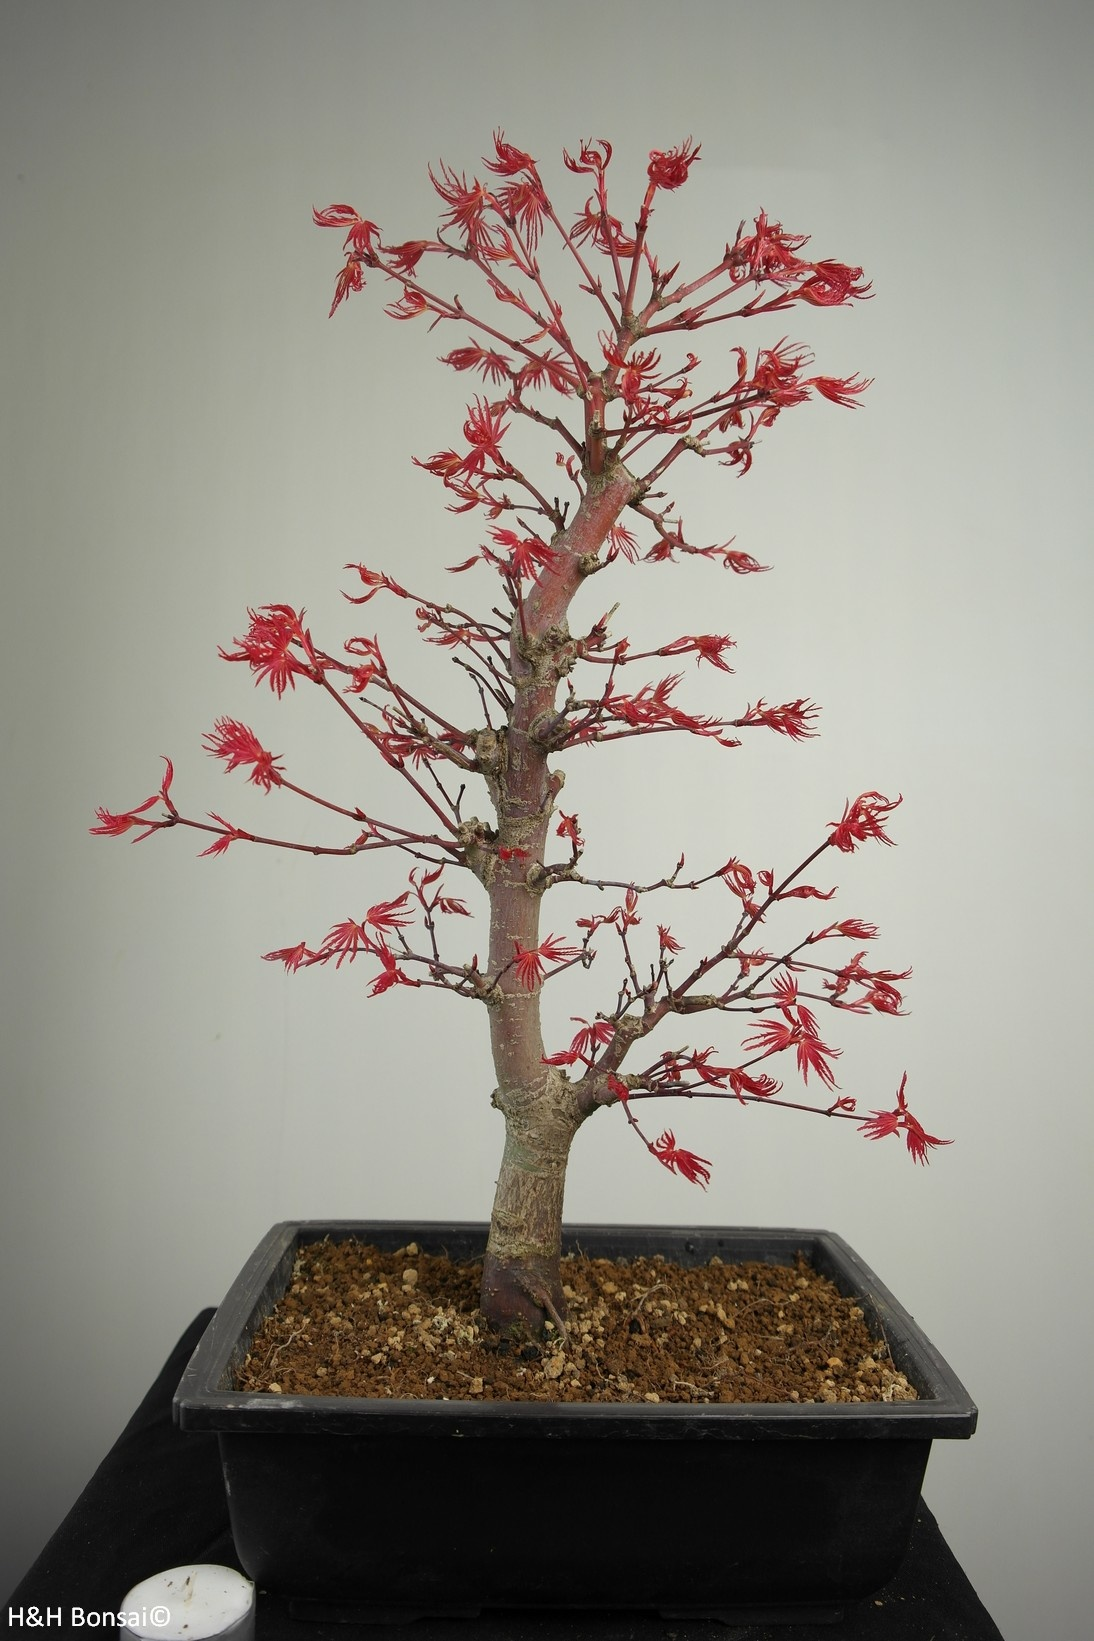 Bonsai Erable du Japon deshojo, Acer palmatum deshojo, no. 7753